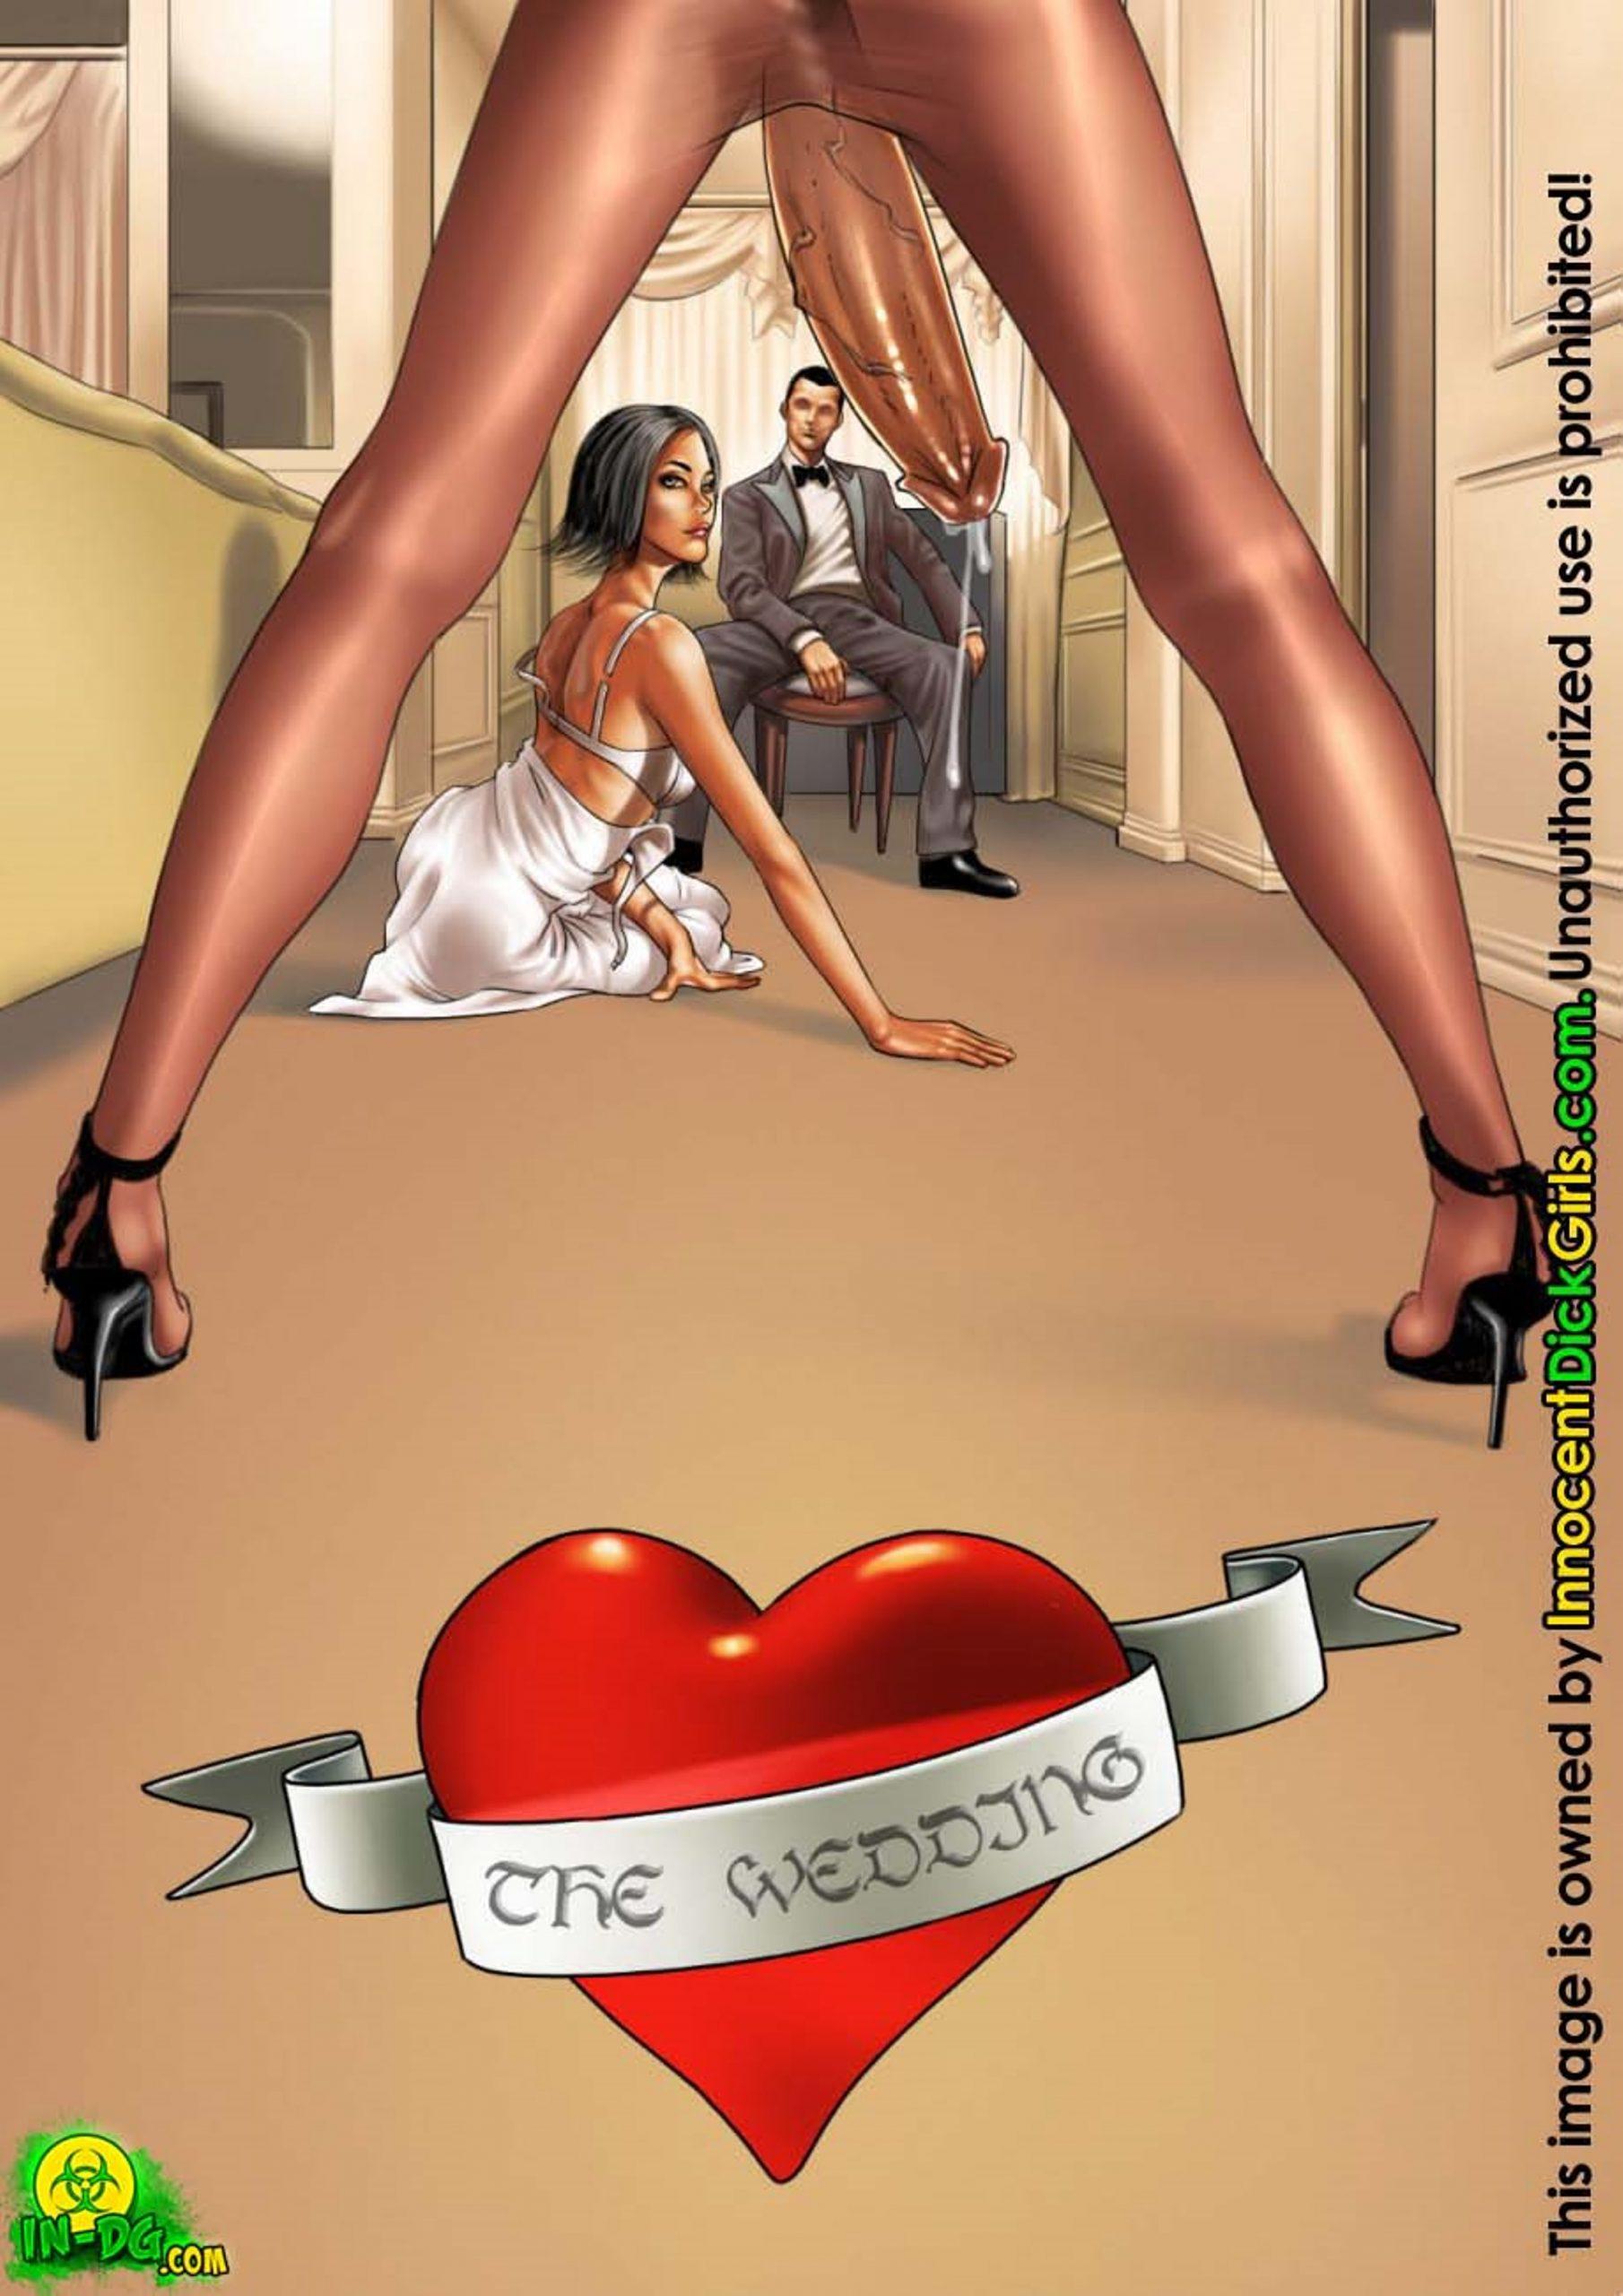 INNOCENT DICKGIRLS - THE WEDDING